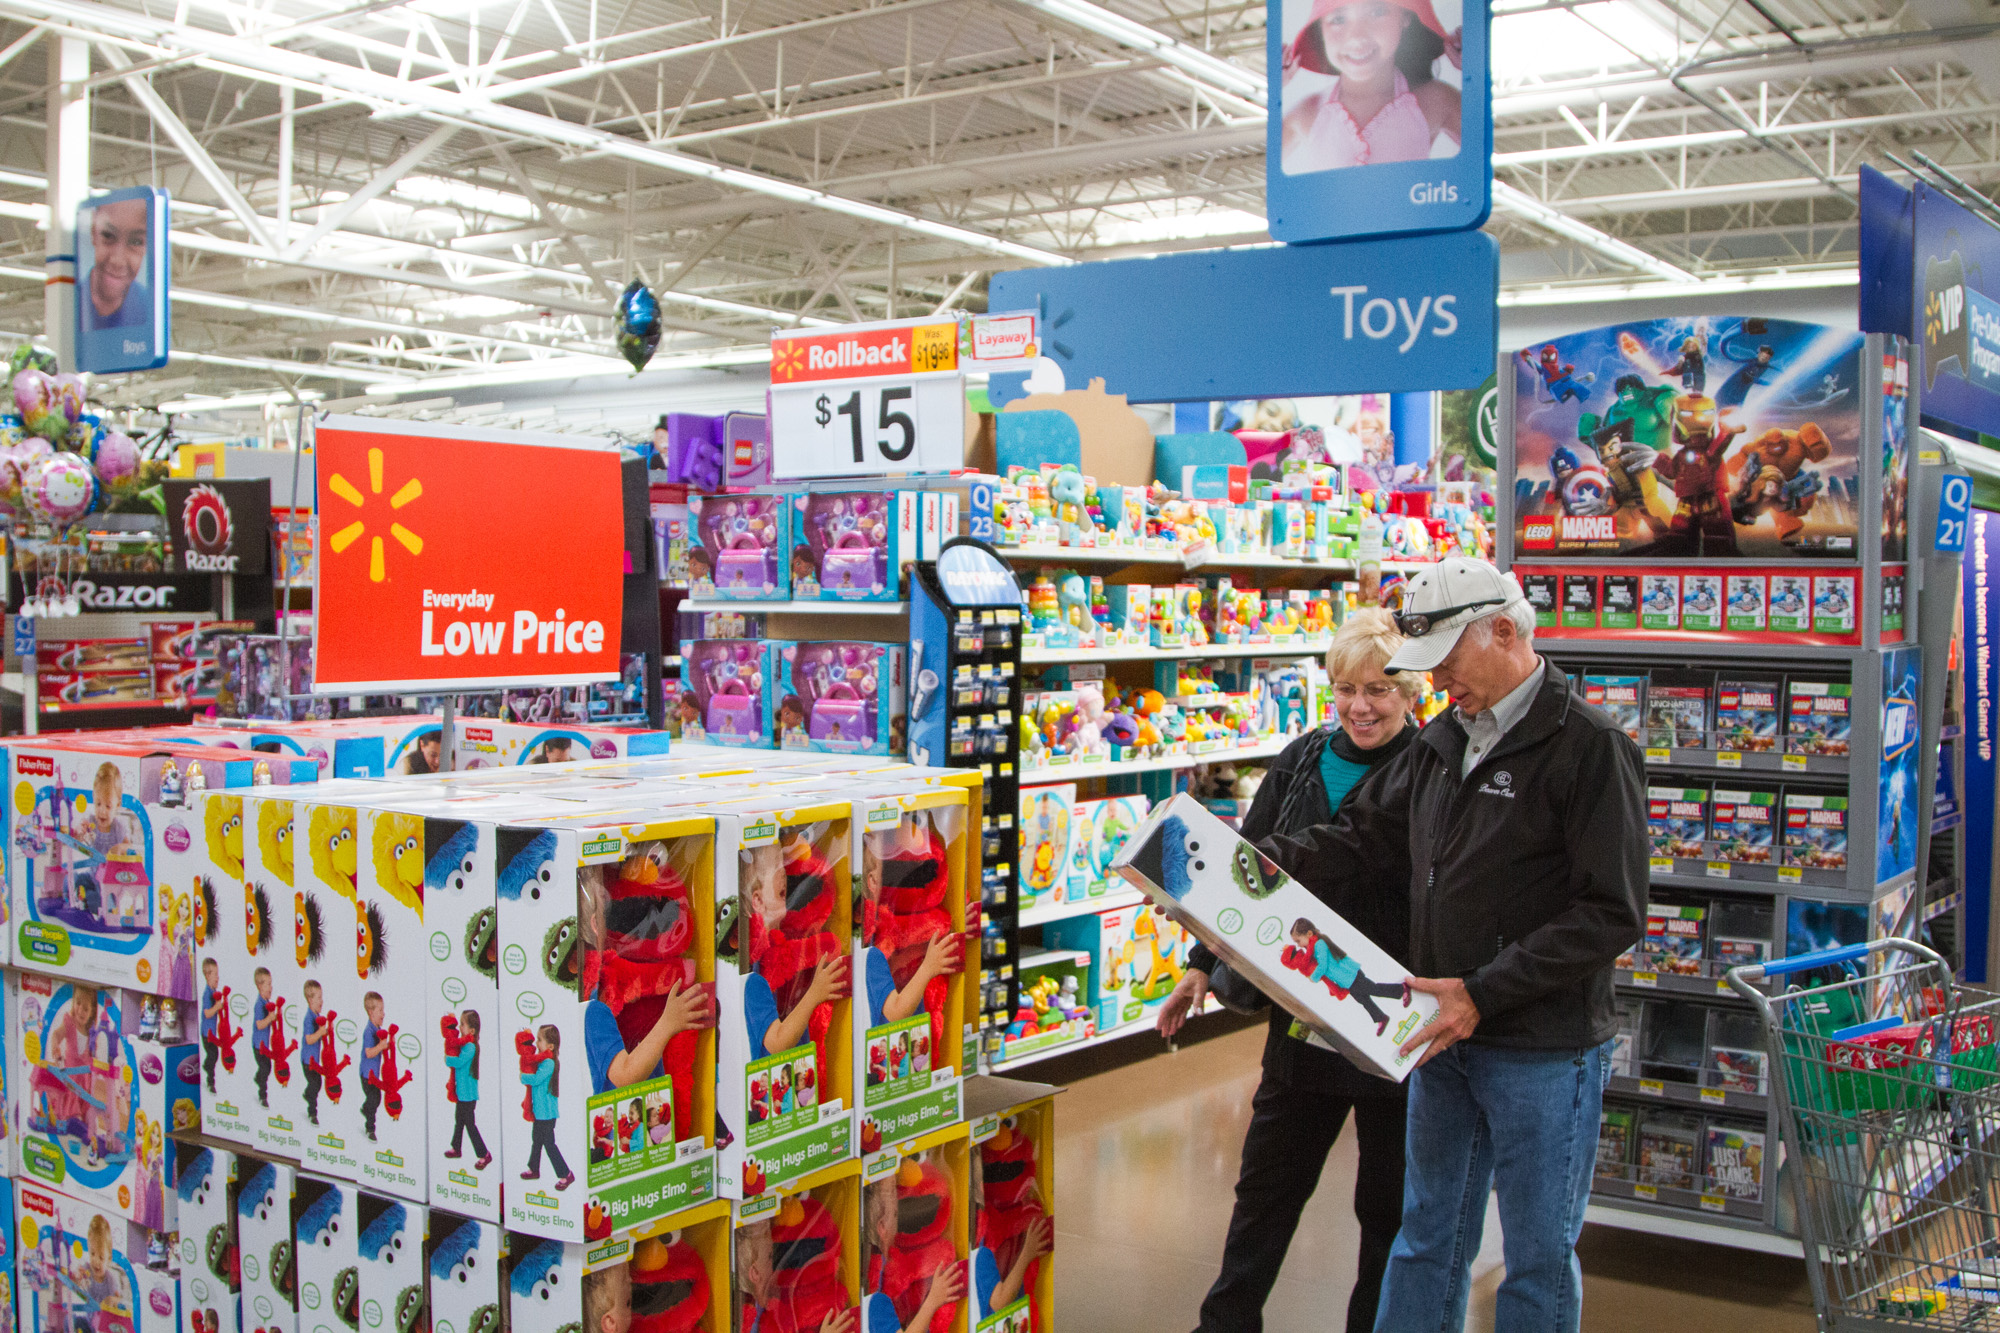 Toys At Walmart : Customers shopping black friday toys